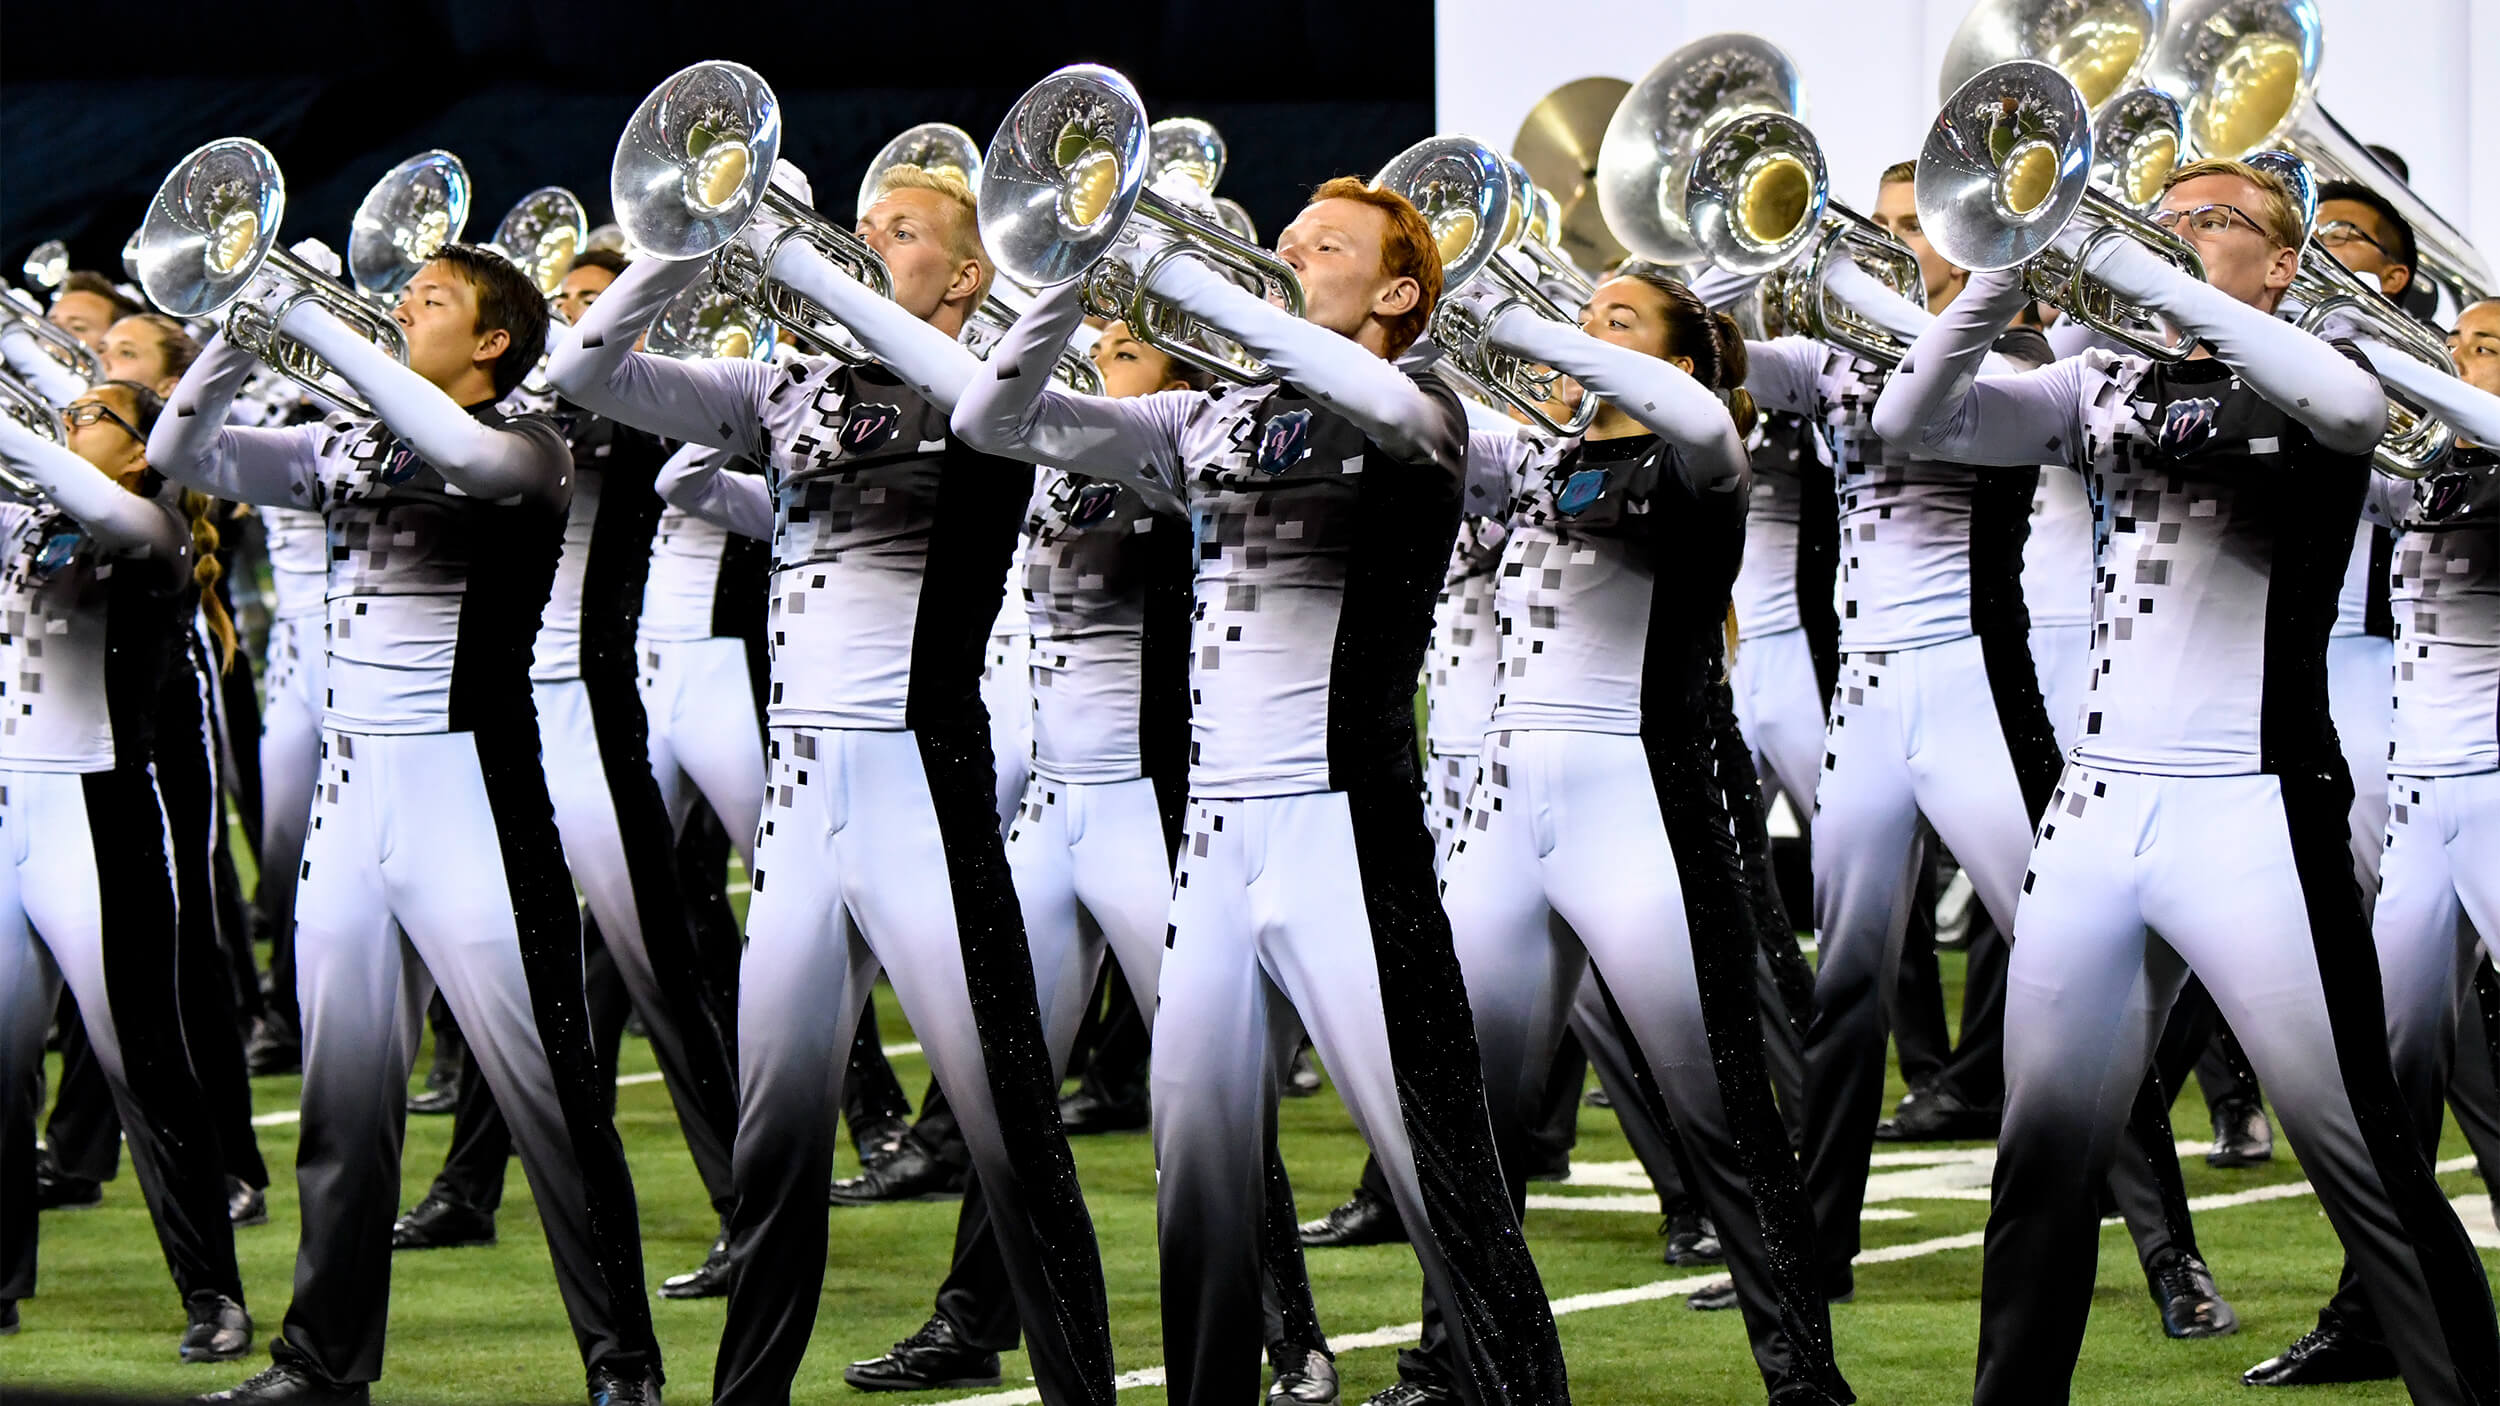 Every Open Class Best Brass Performance caption award winner of the 2010s